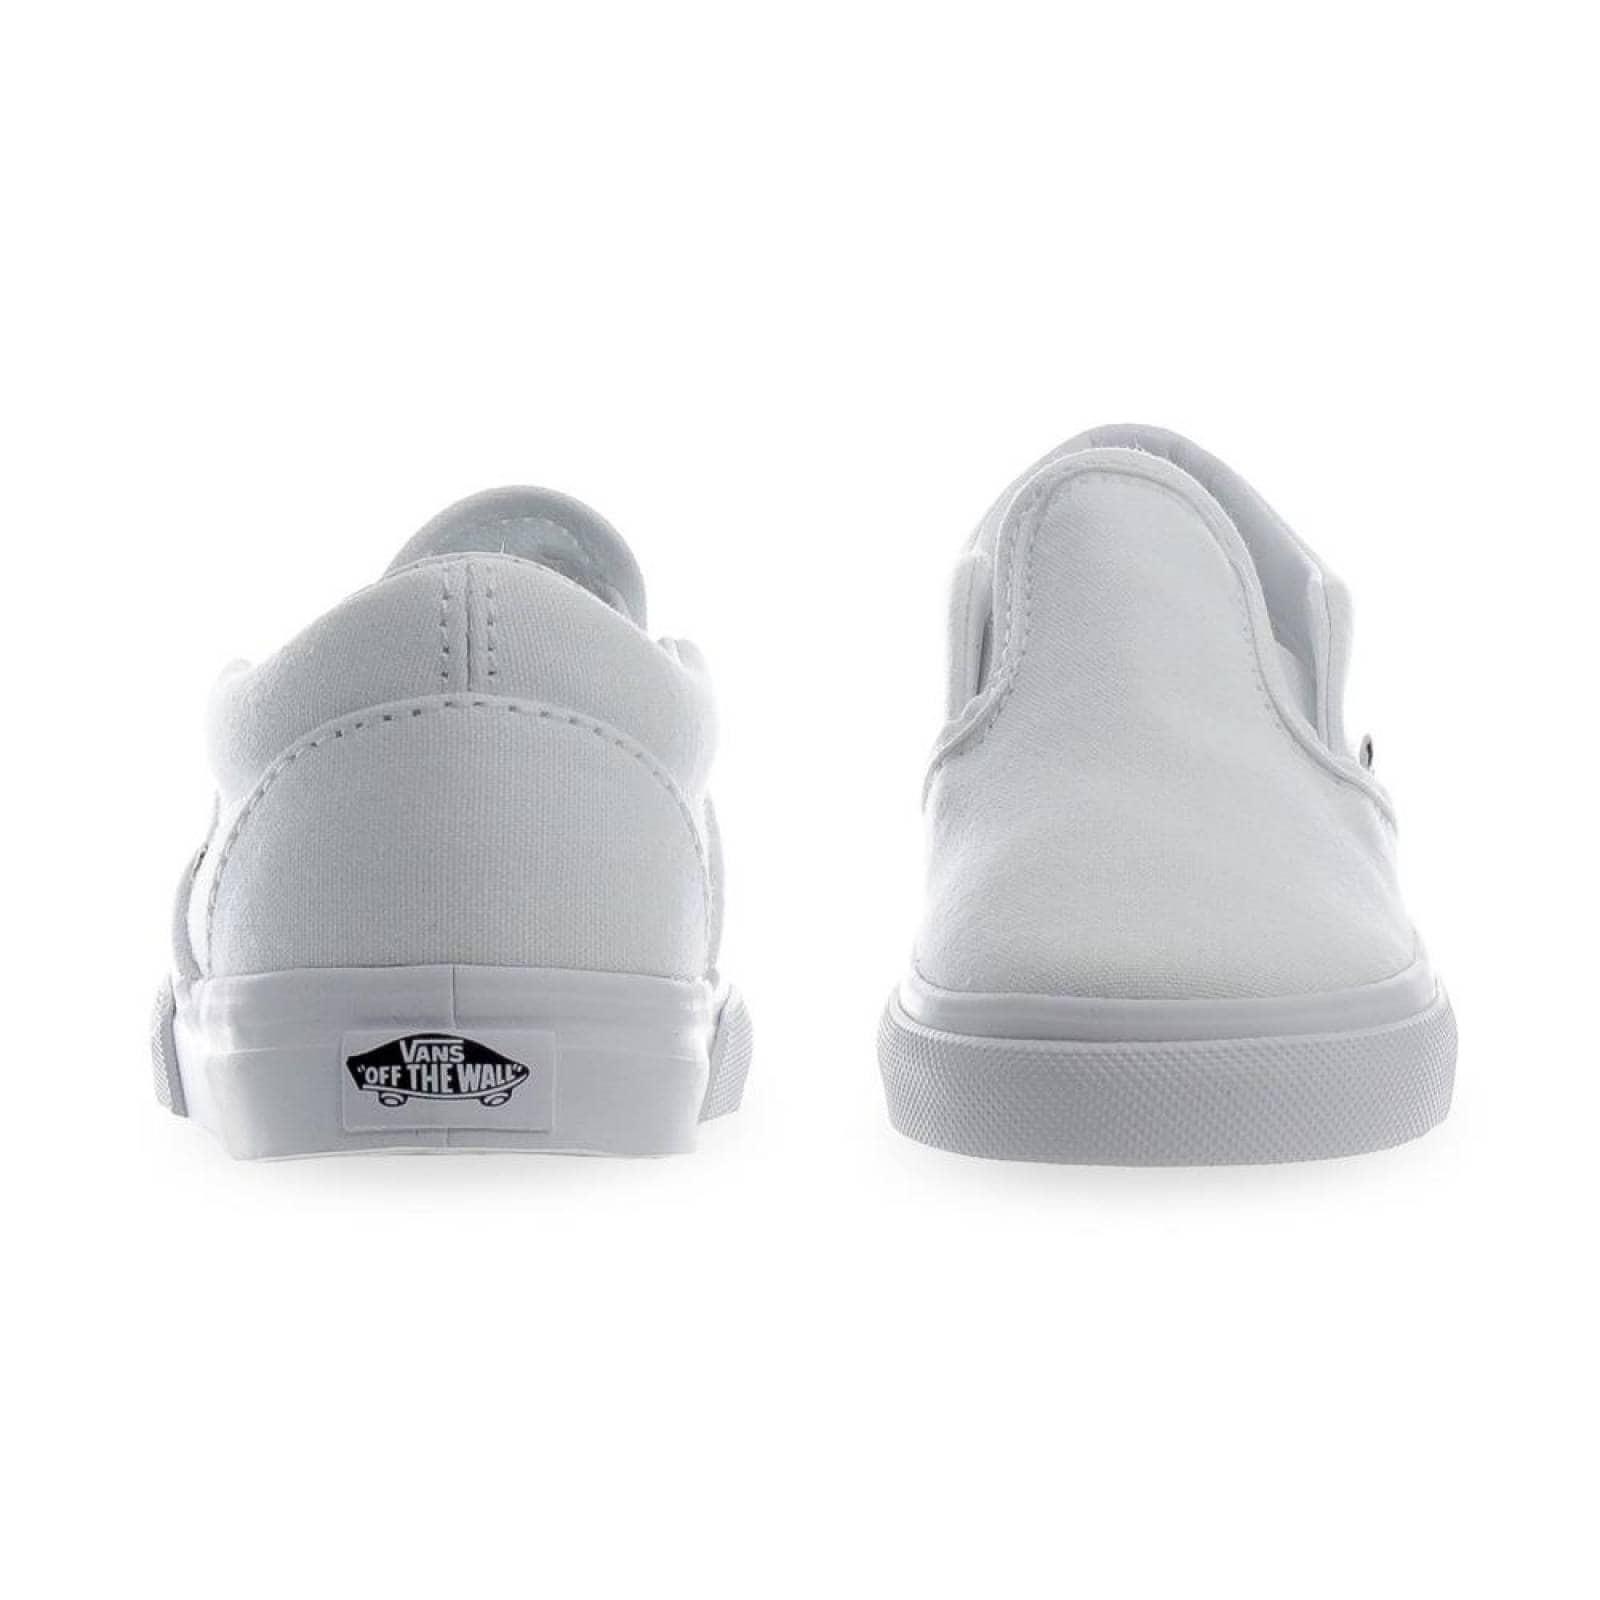 Tenis Vans Classic Slip On TD - 0EX8W00 - Blanco - Bebes